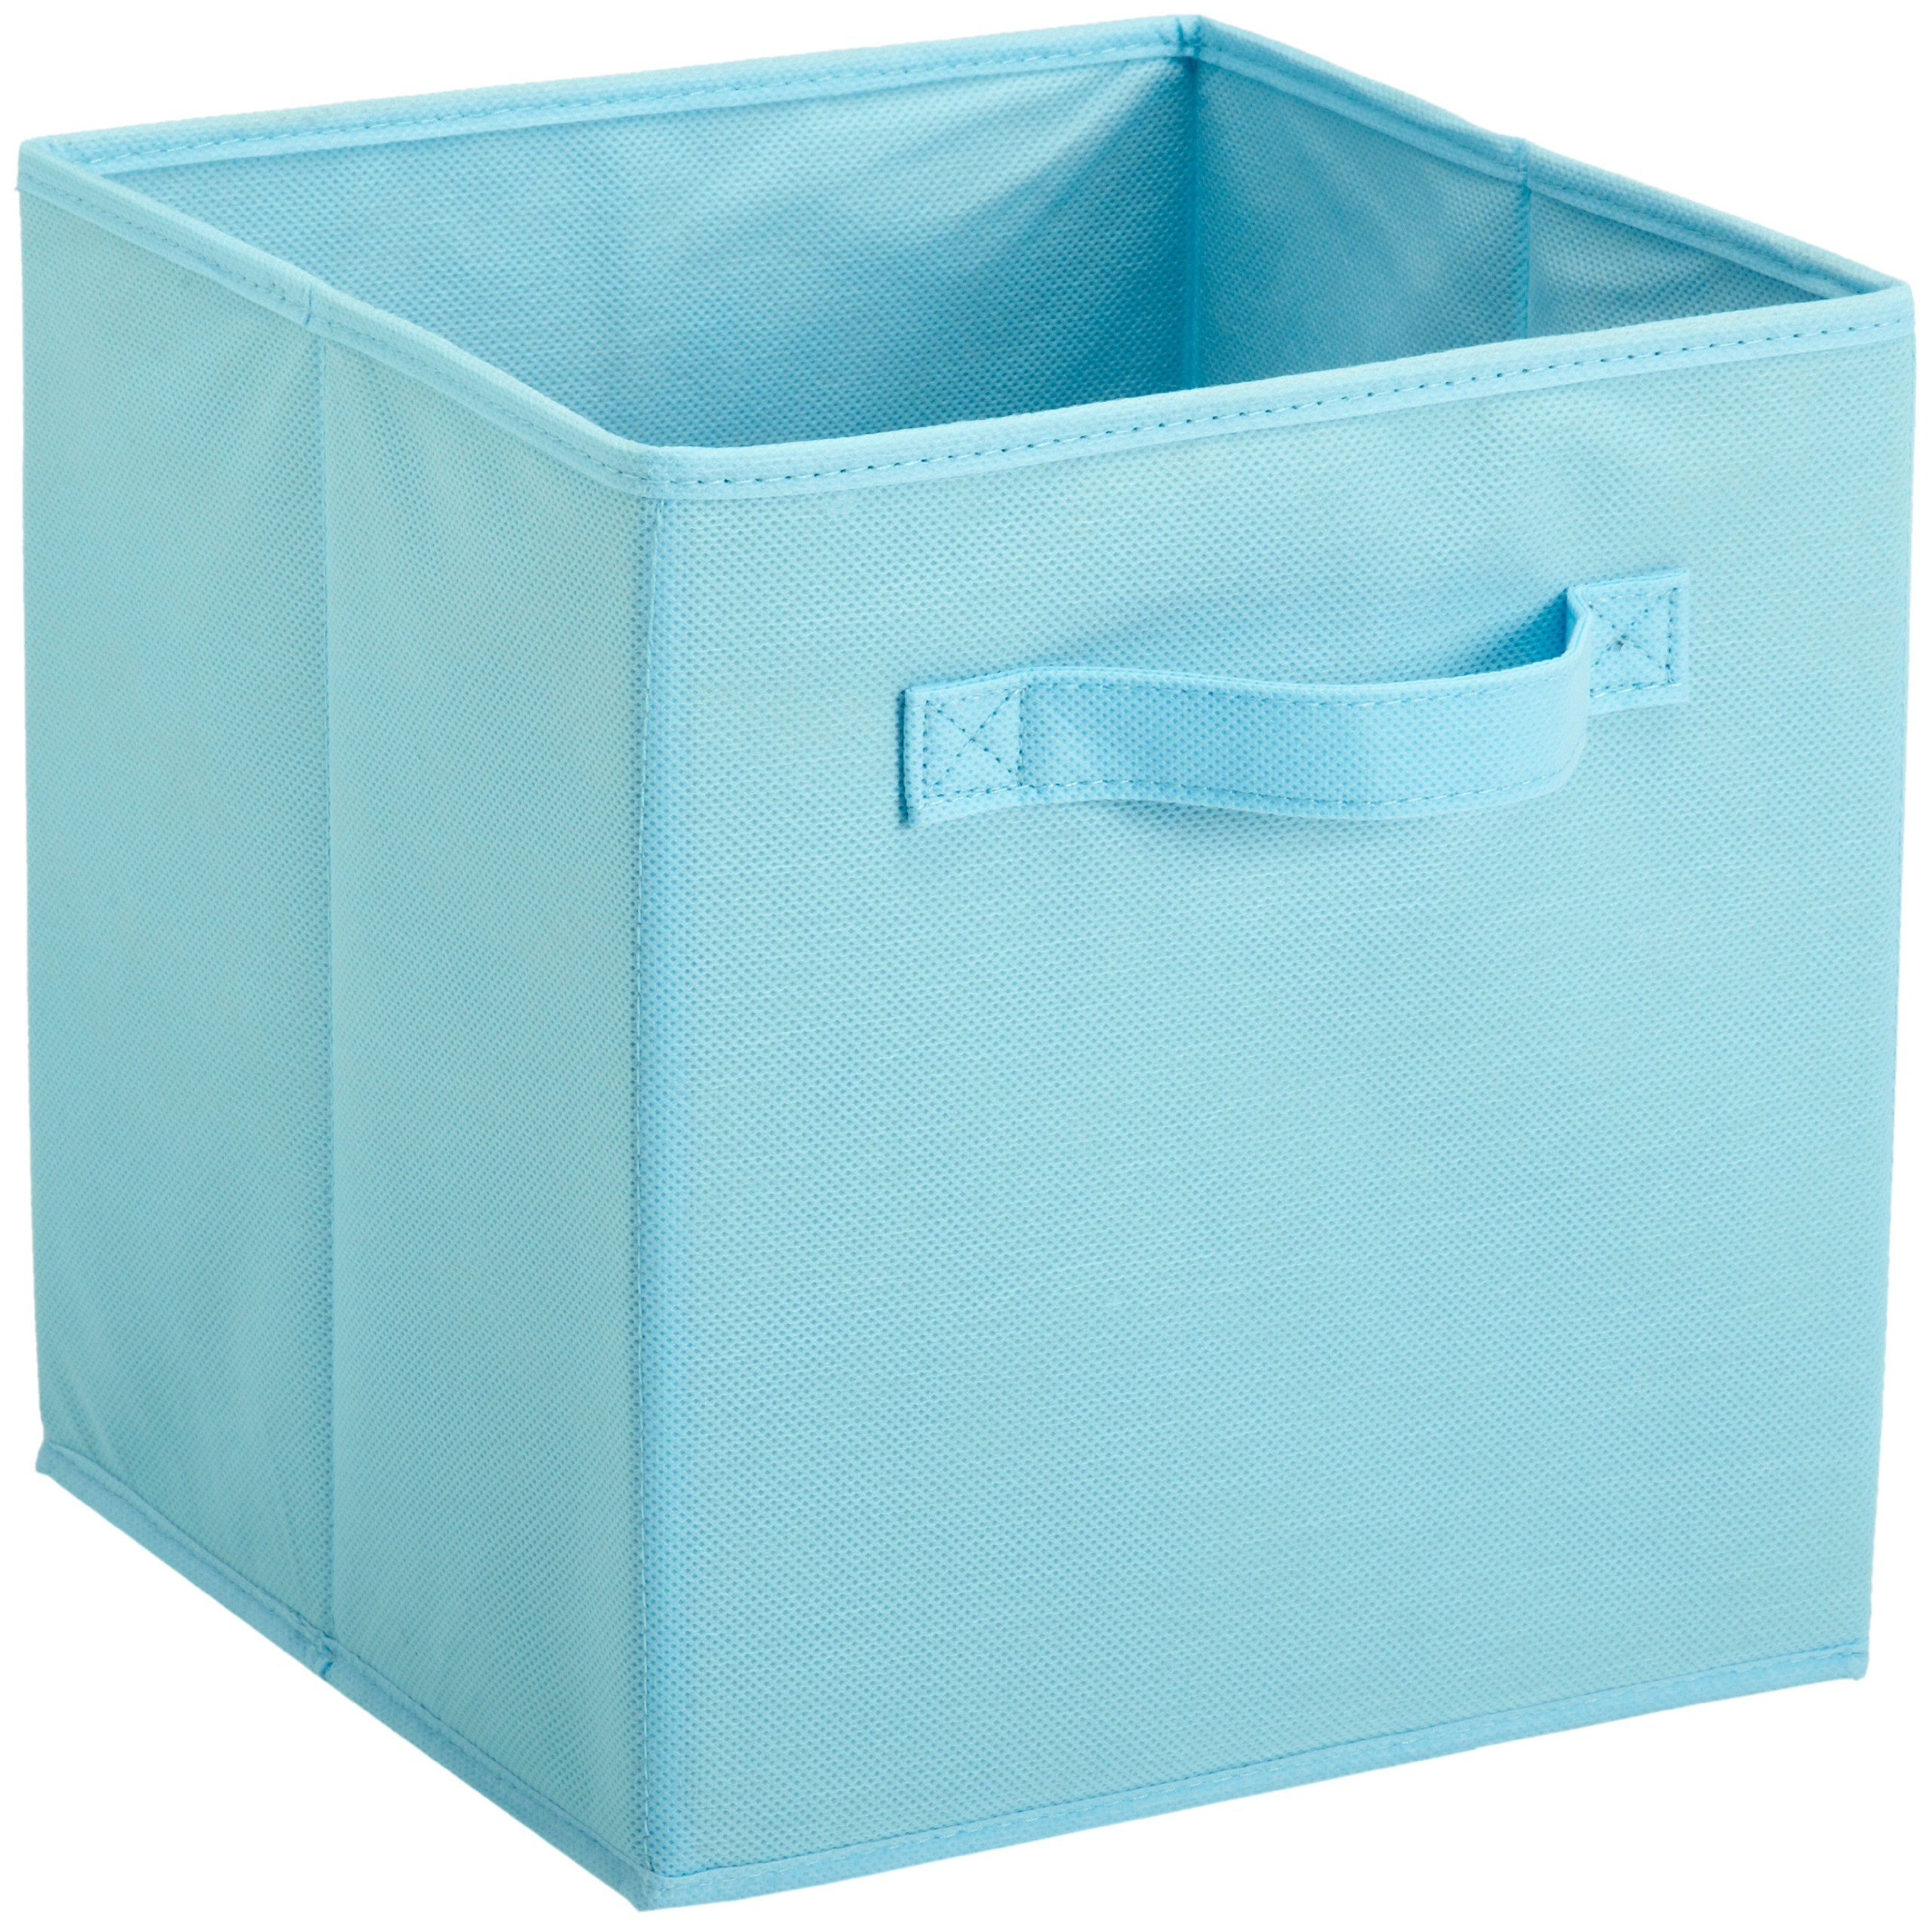 Closetmaid Cubeicals Fabric Drawer Pale Blue Fabric Storage